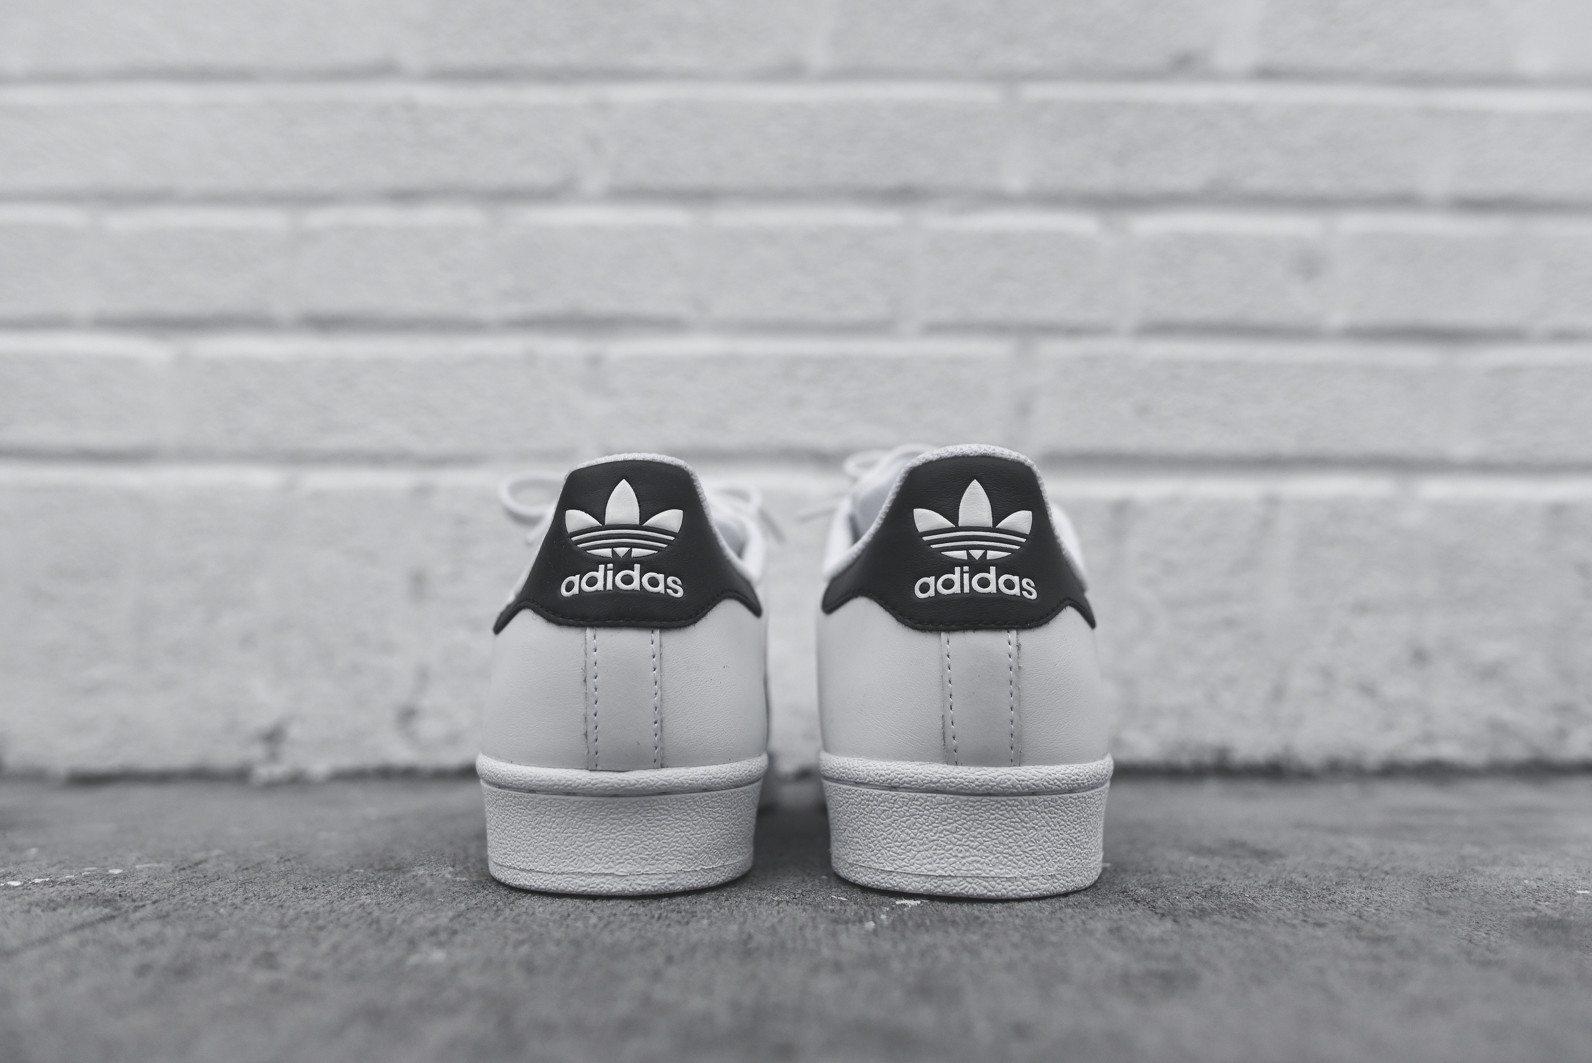 adidas Originals Superstar White Black 5